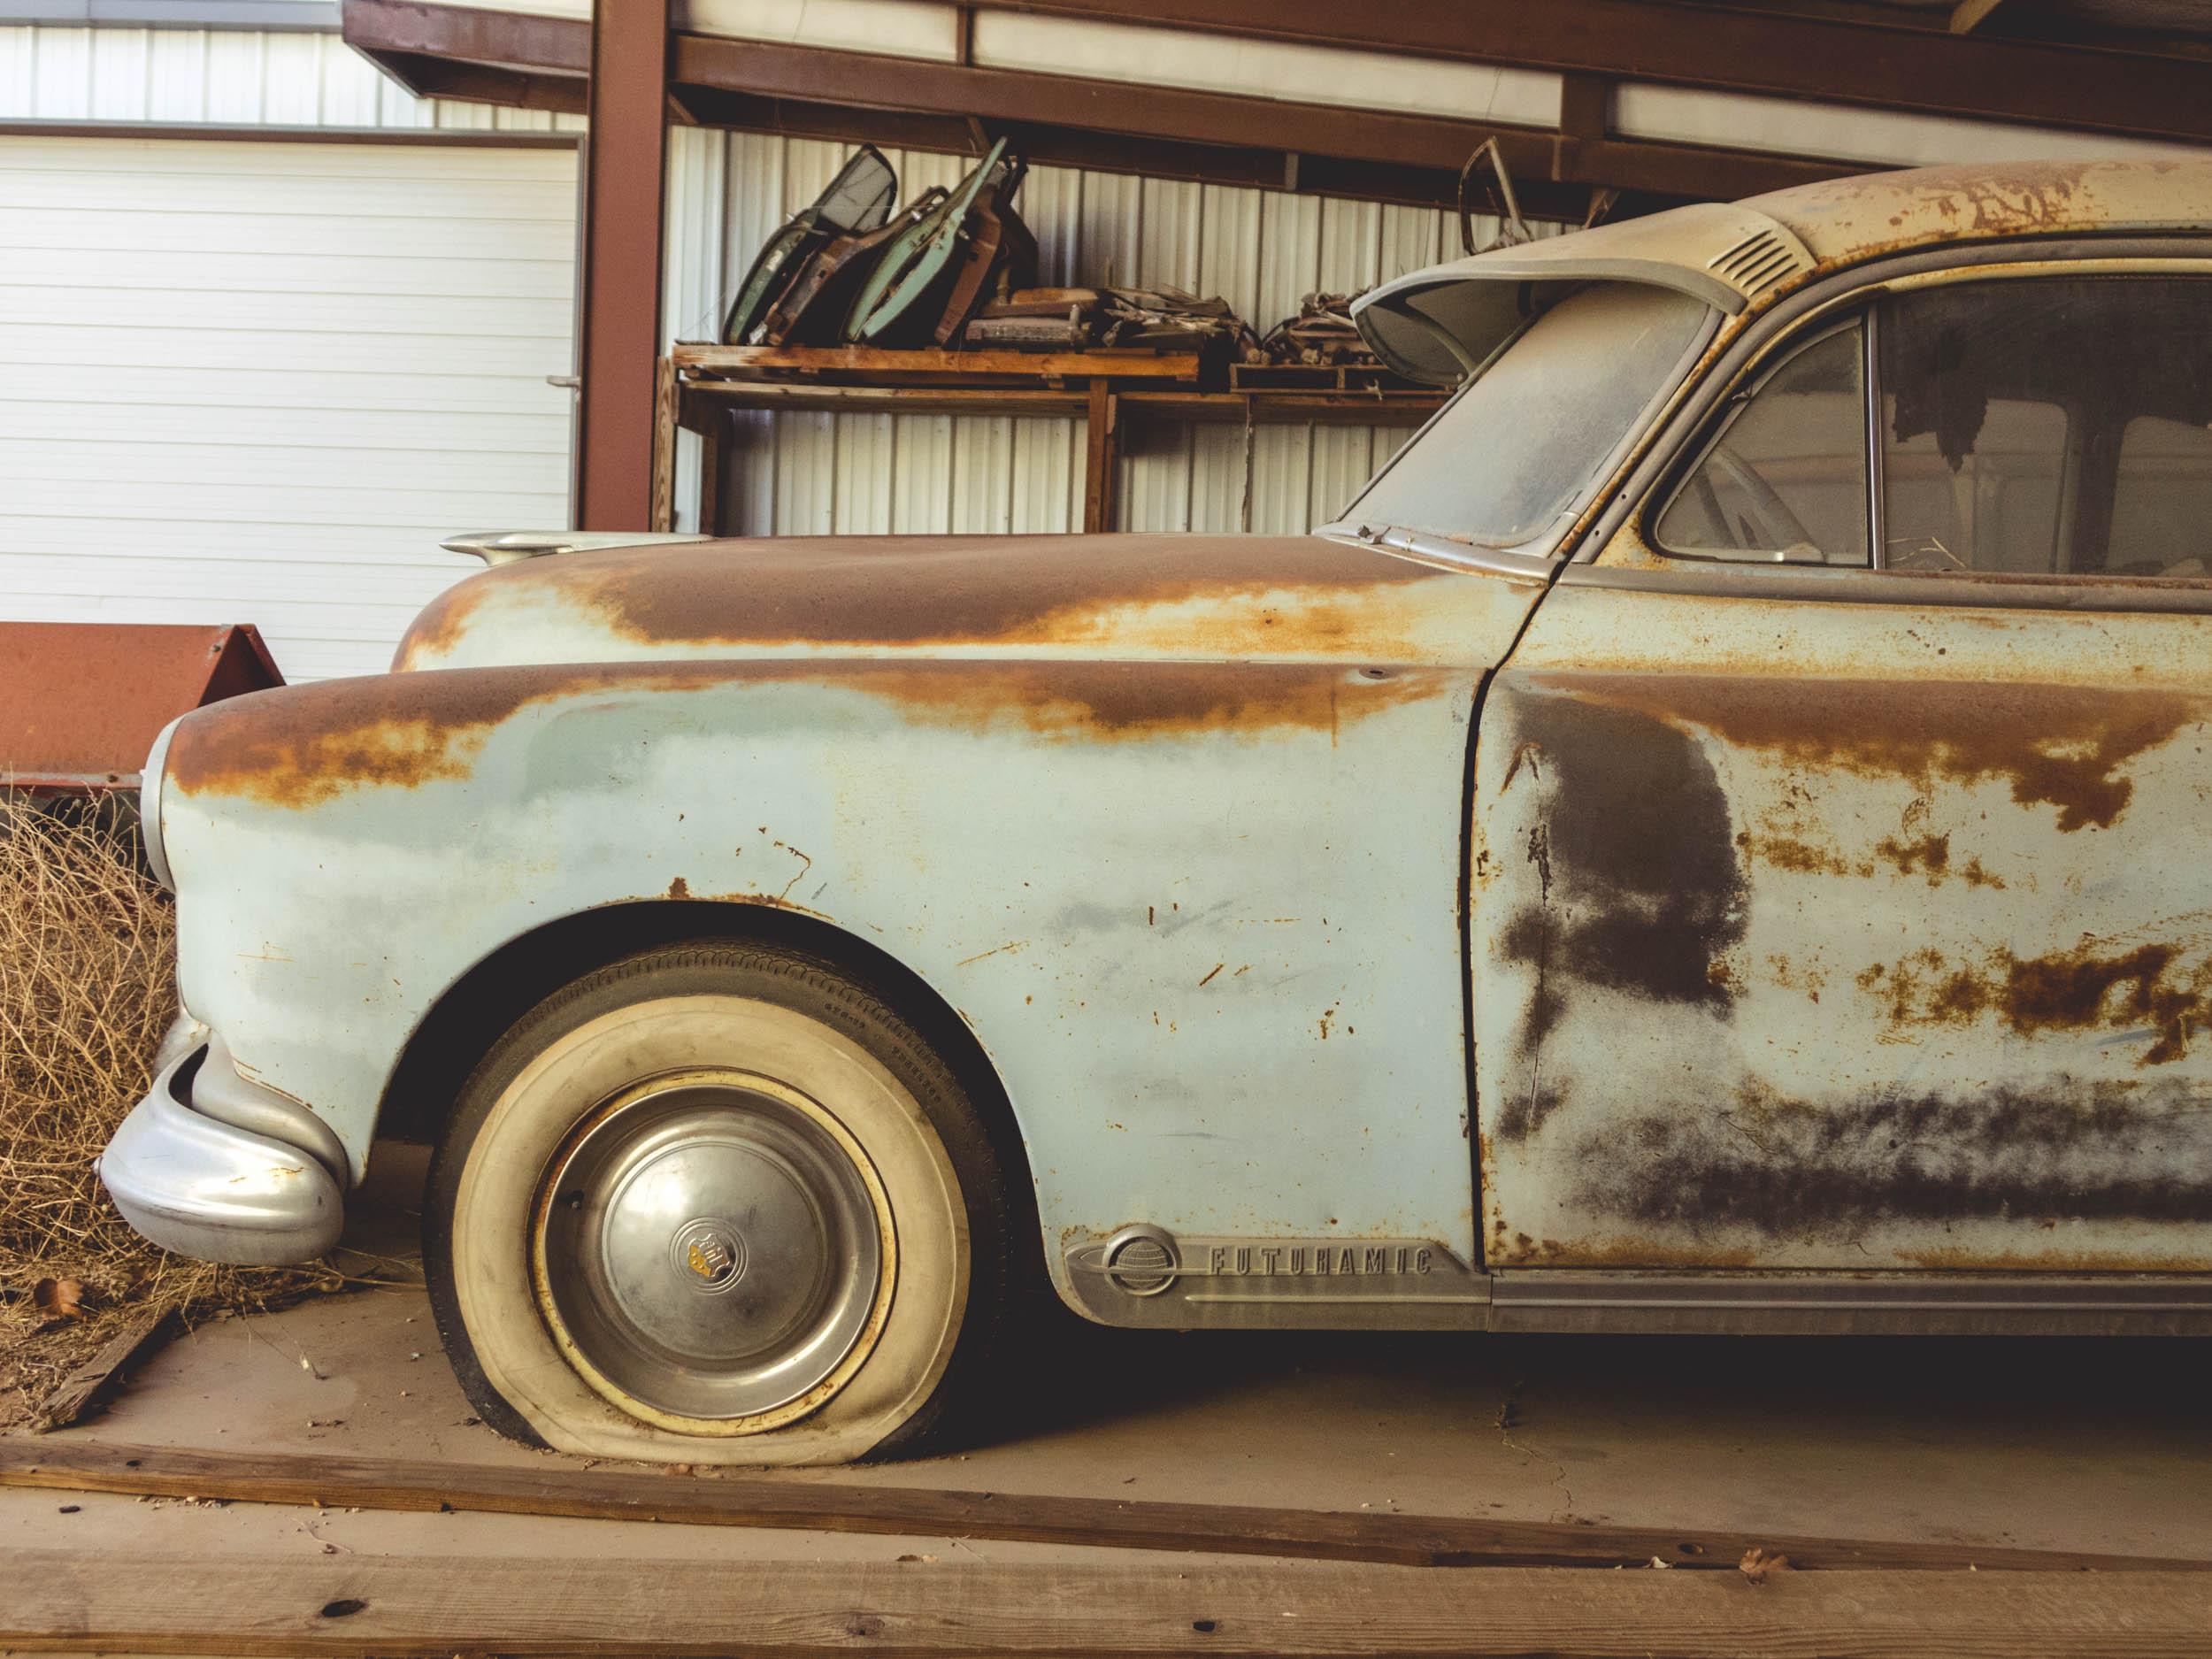 Oldsmobile 88 front